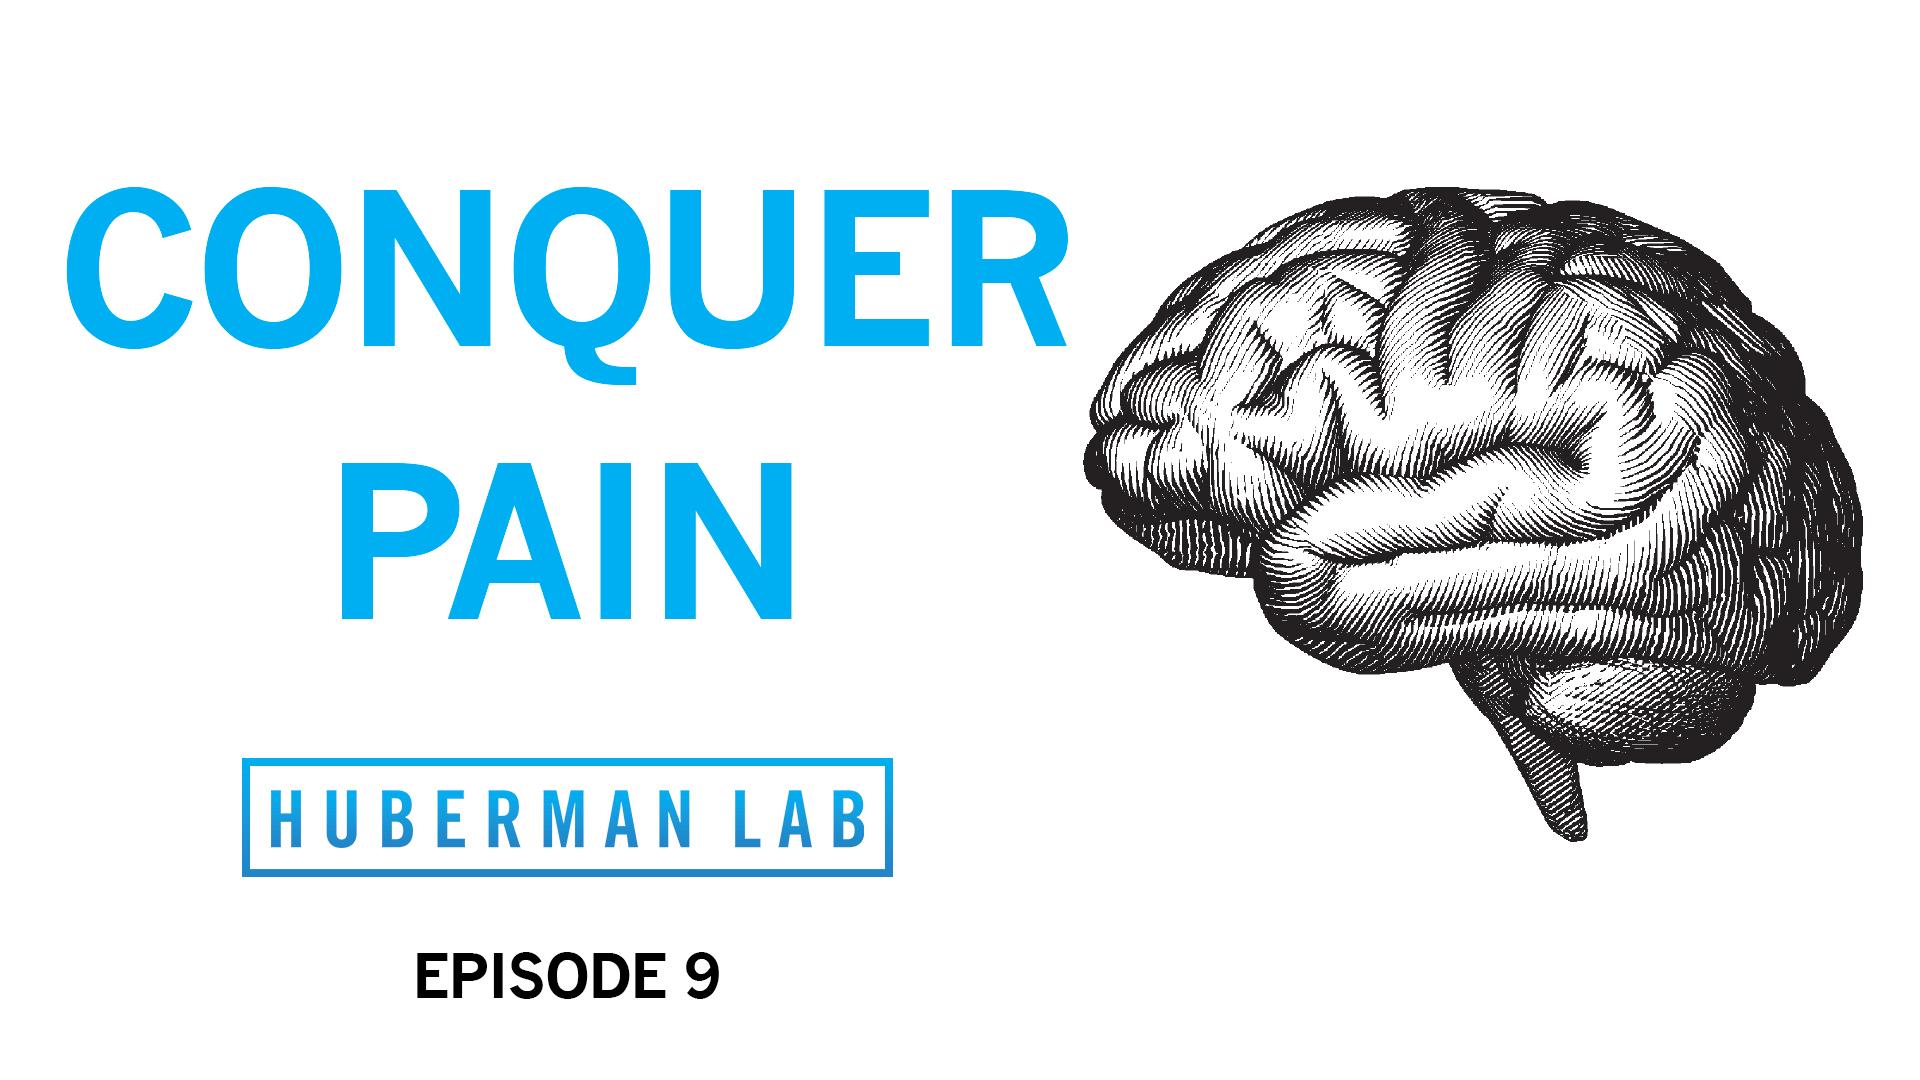 Huberman Lab Podcast Episode 9 Title Card